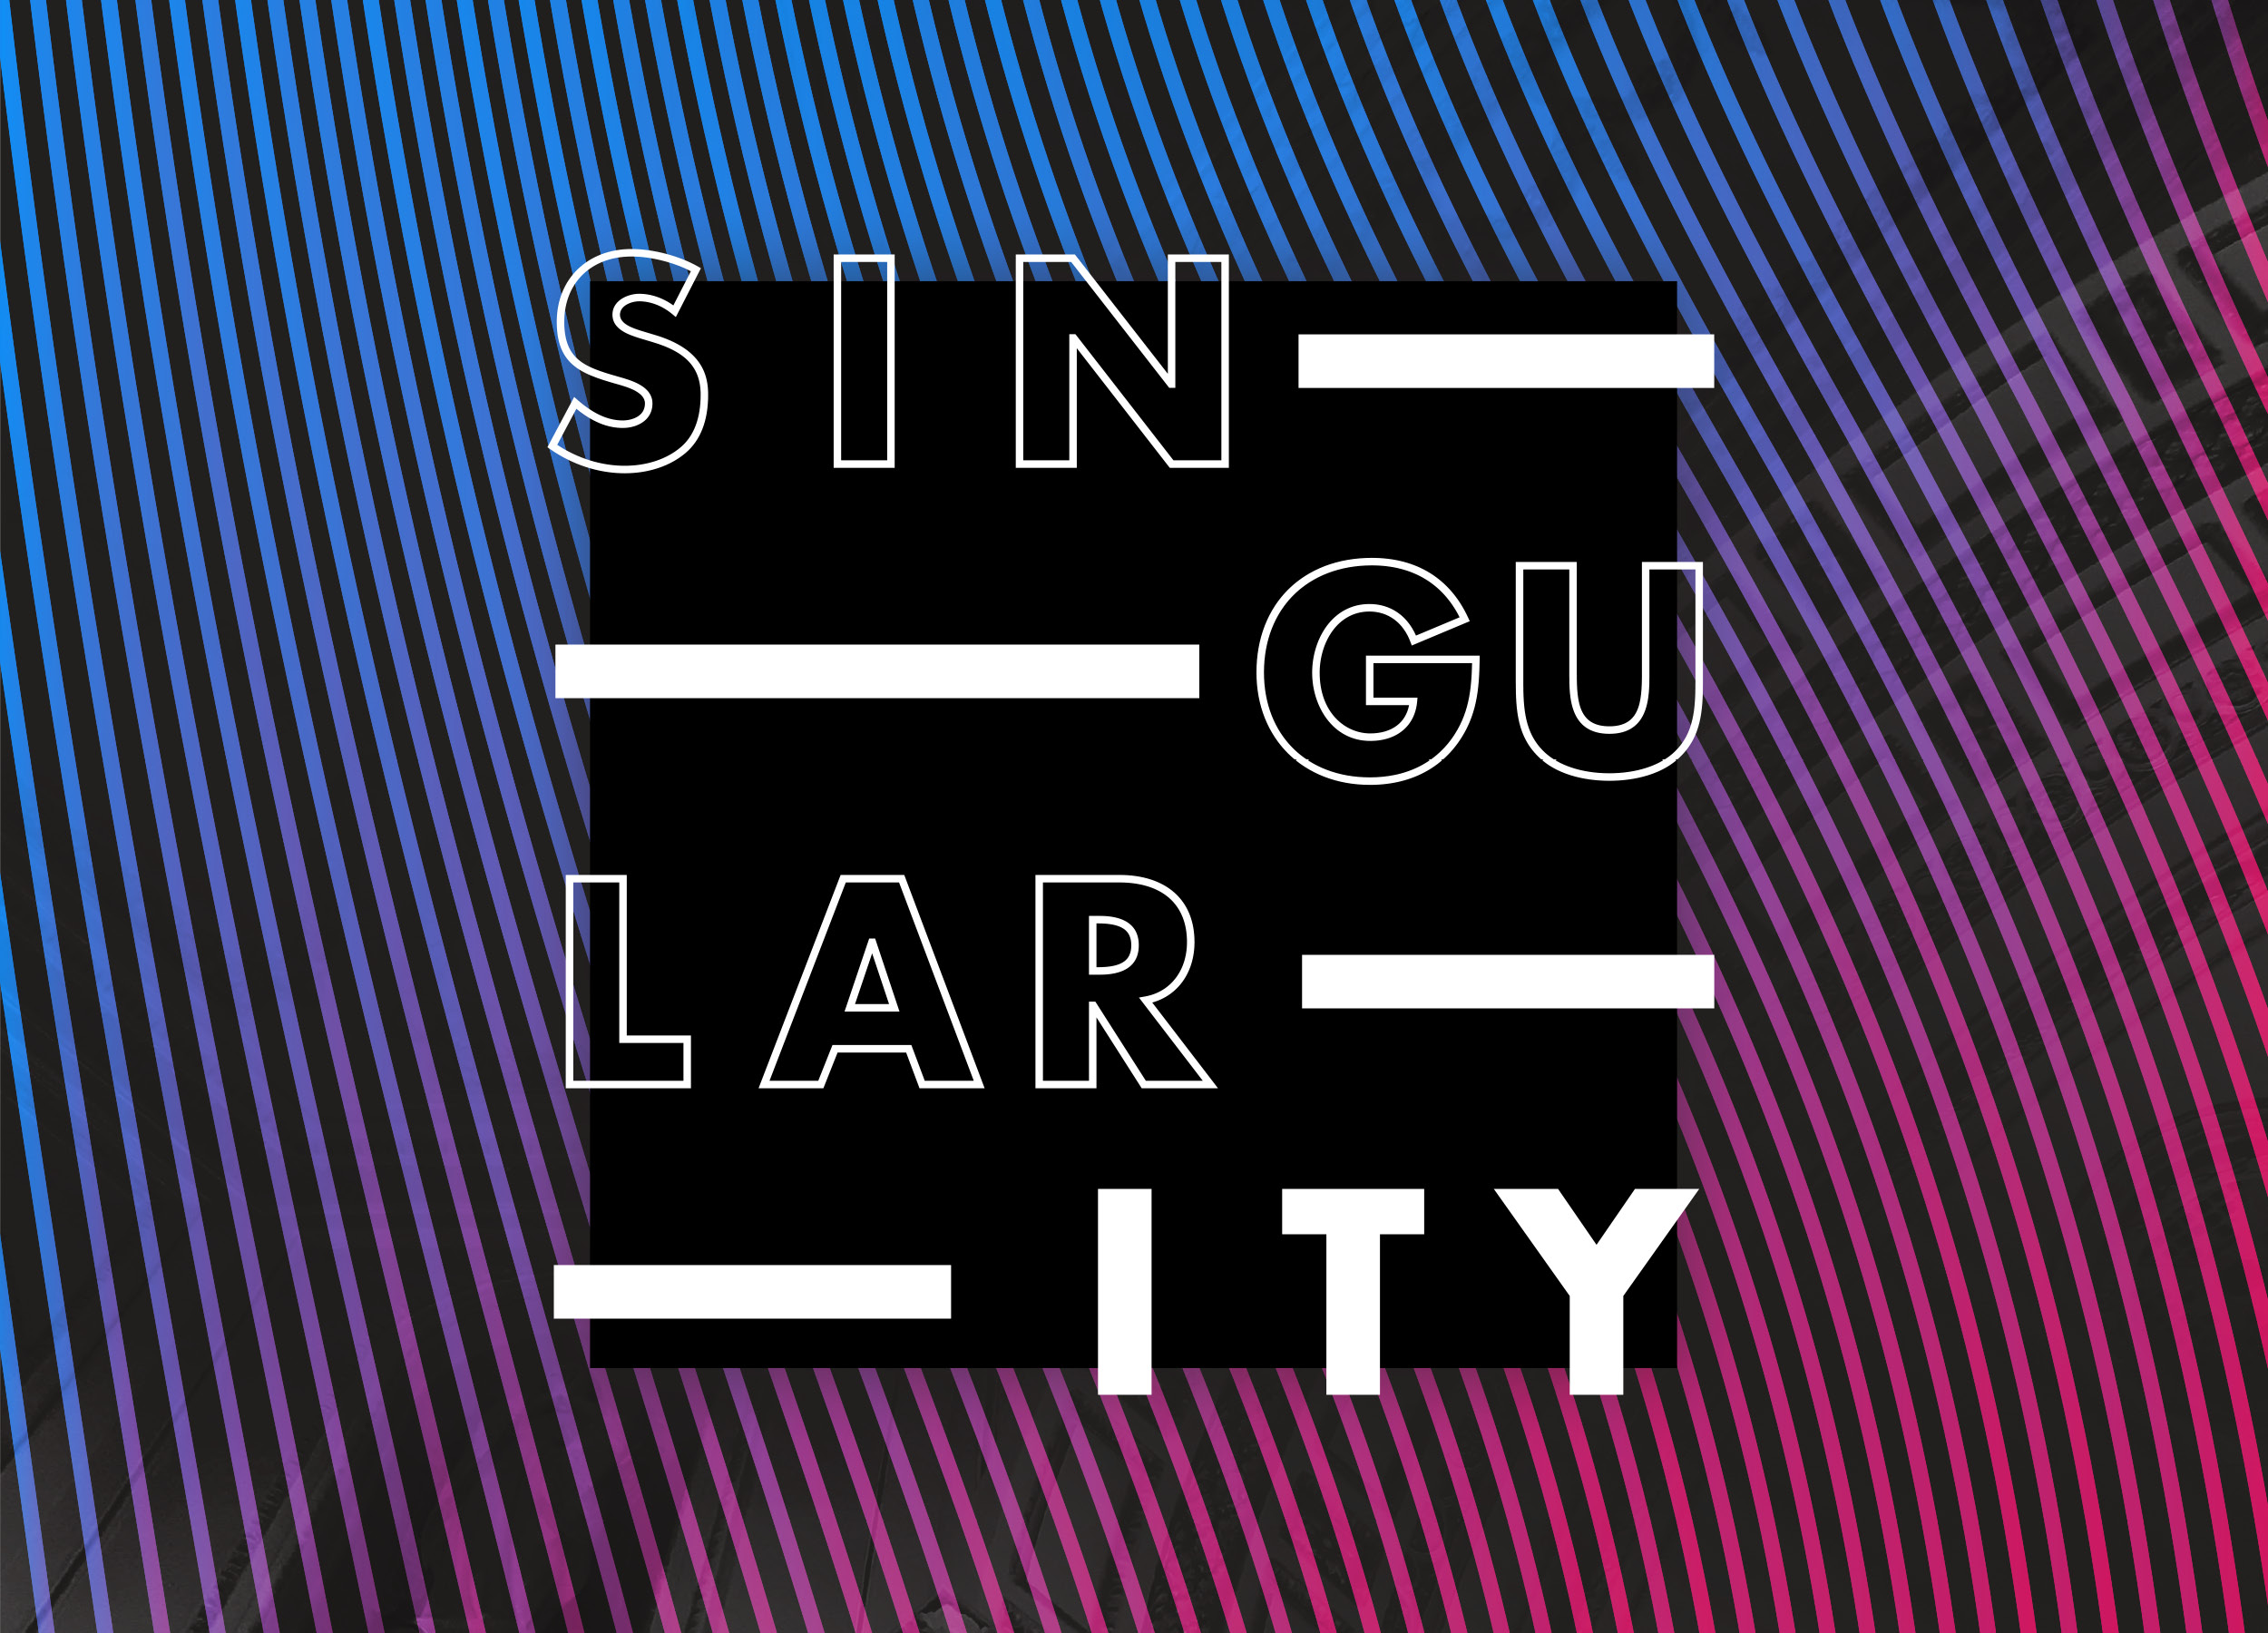 singularity4.jpg